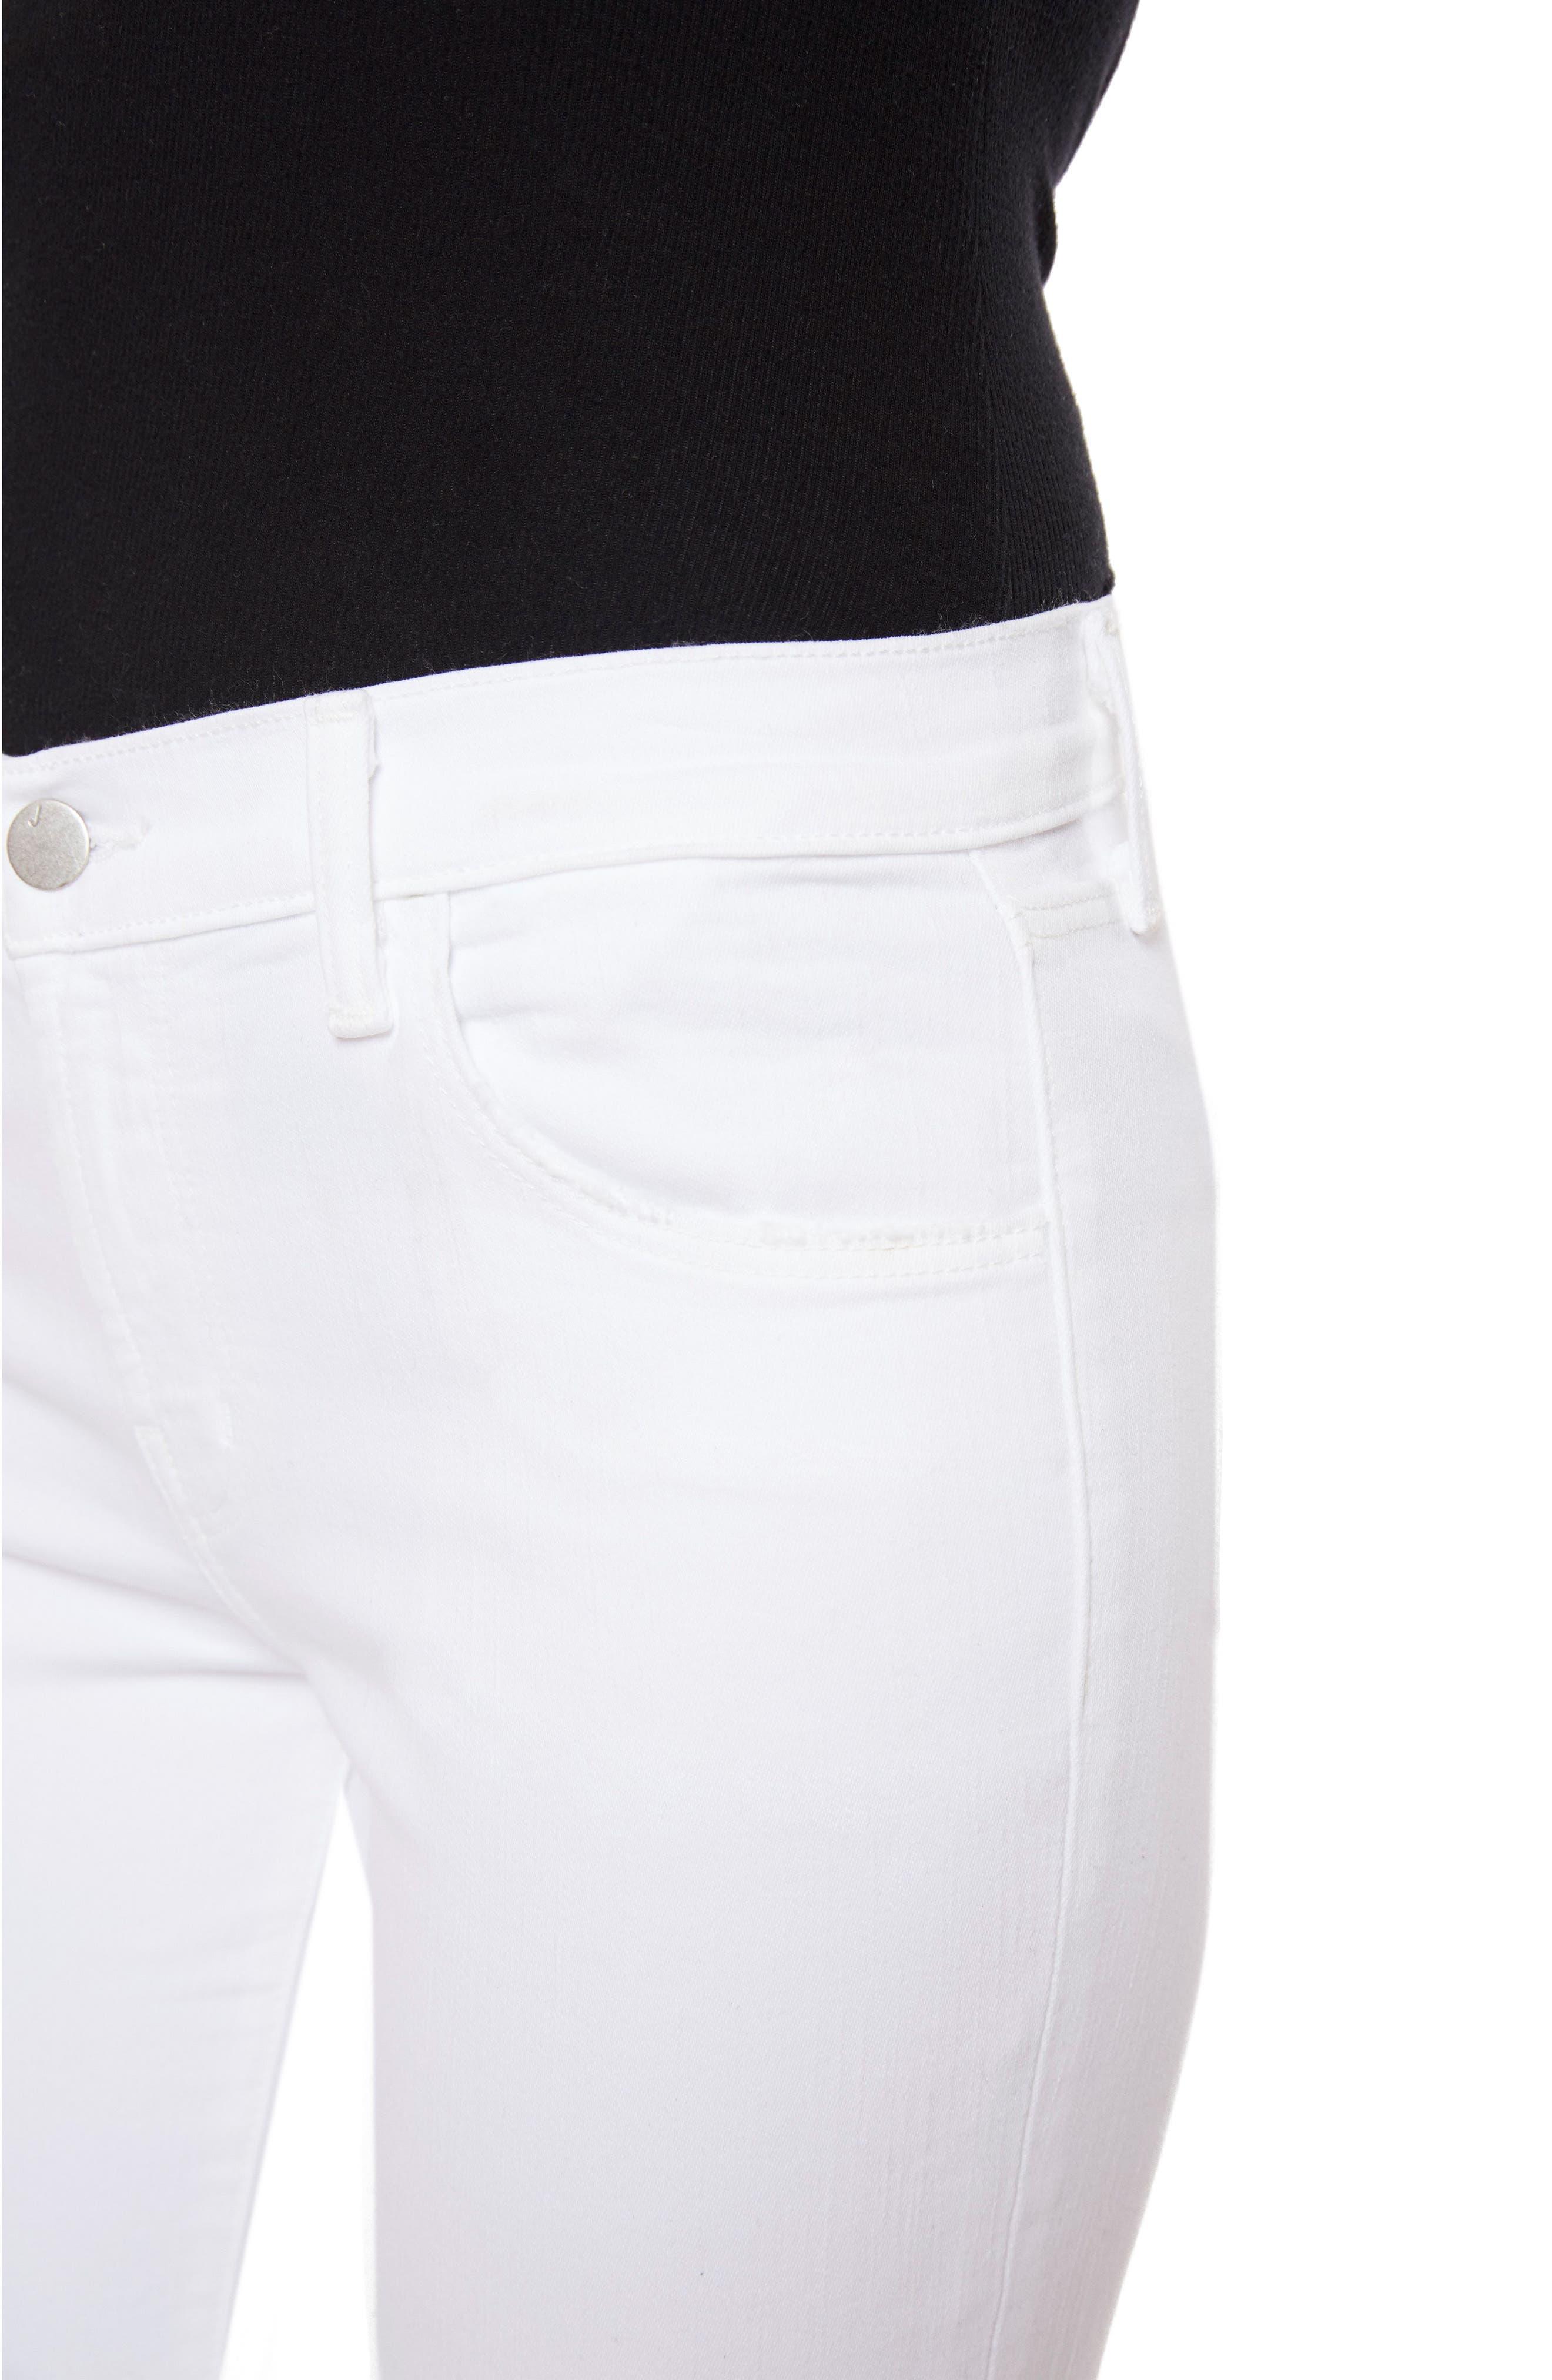 835 Capri Skinny Jeans,                             Alternate thumbnail 4, color,                             Underexposed